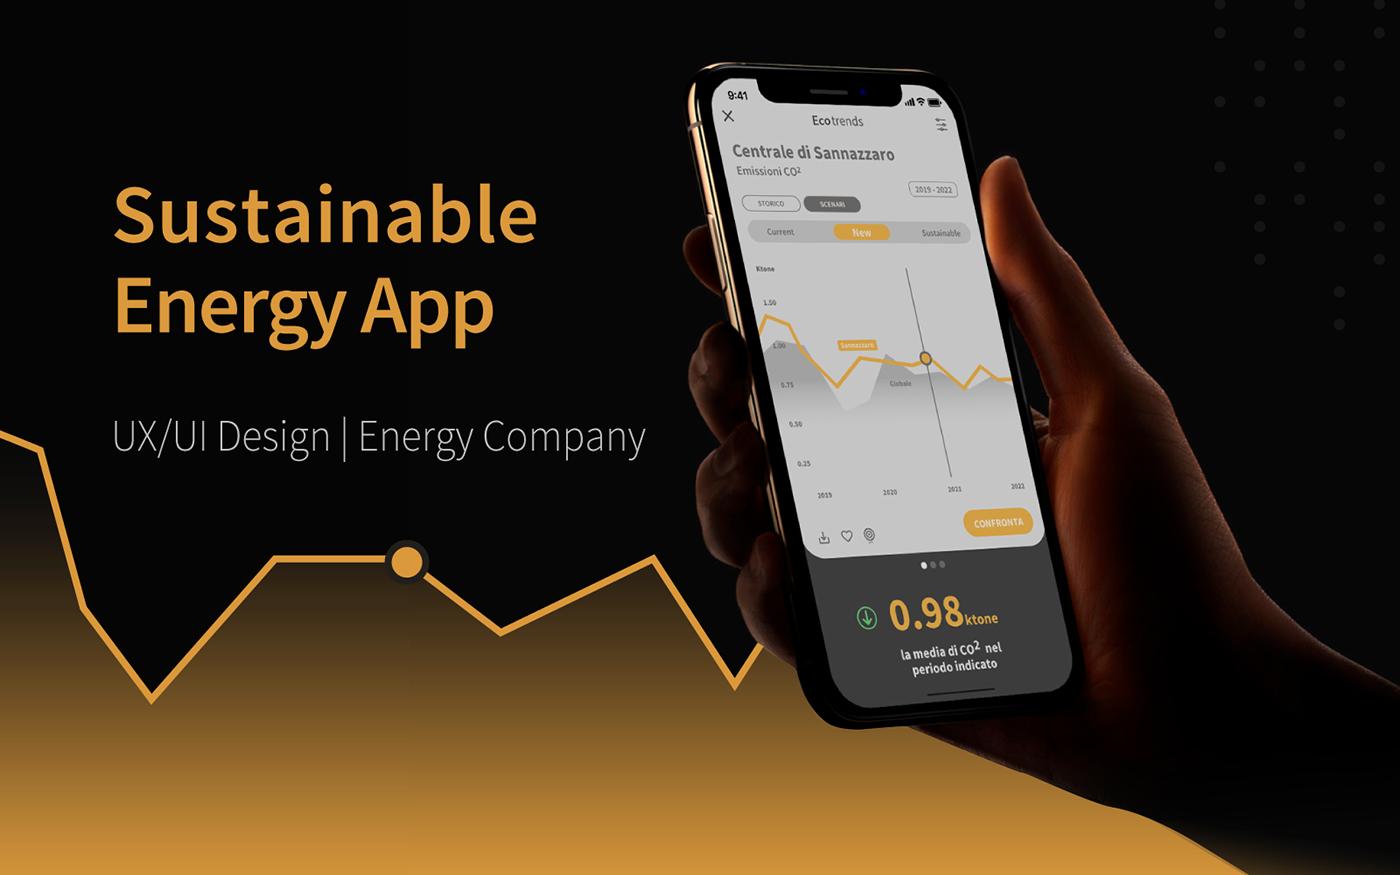 App Di Design sustainable energy app | ux/ui design on behance